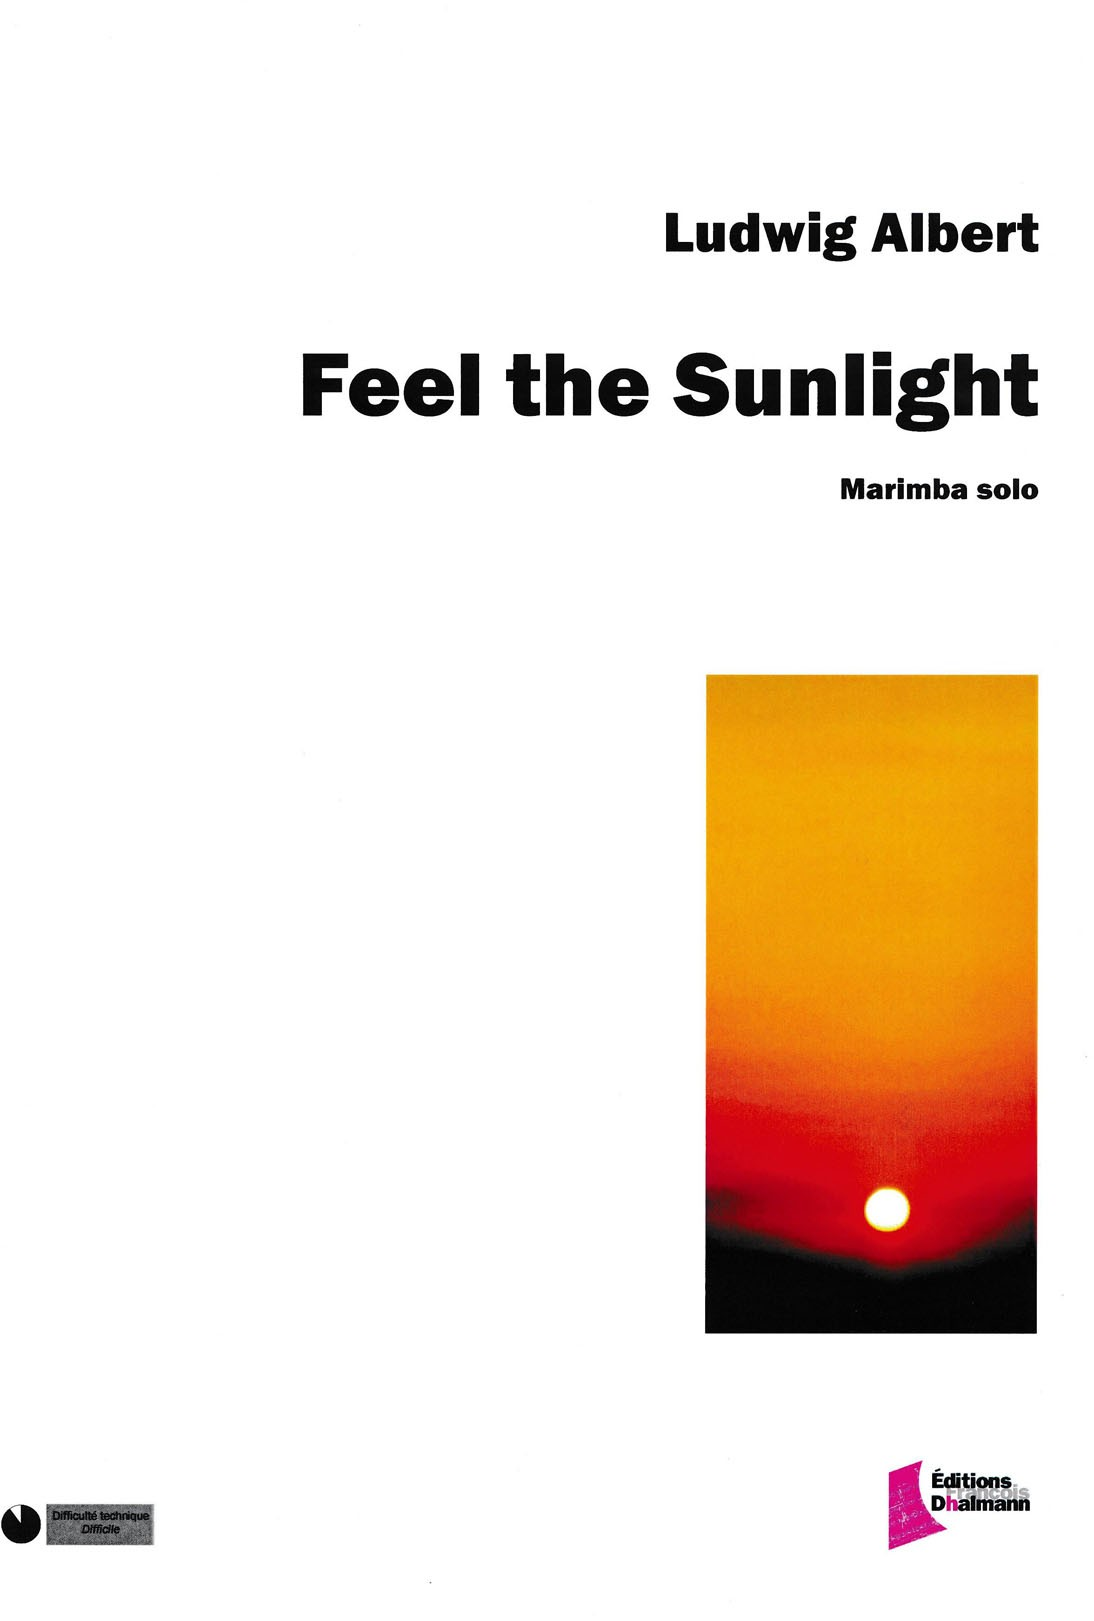 Feel the Sunlight by Ludwig Albert